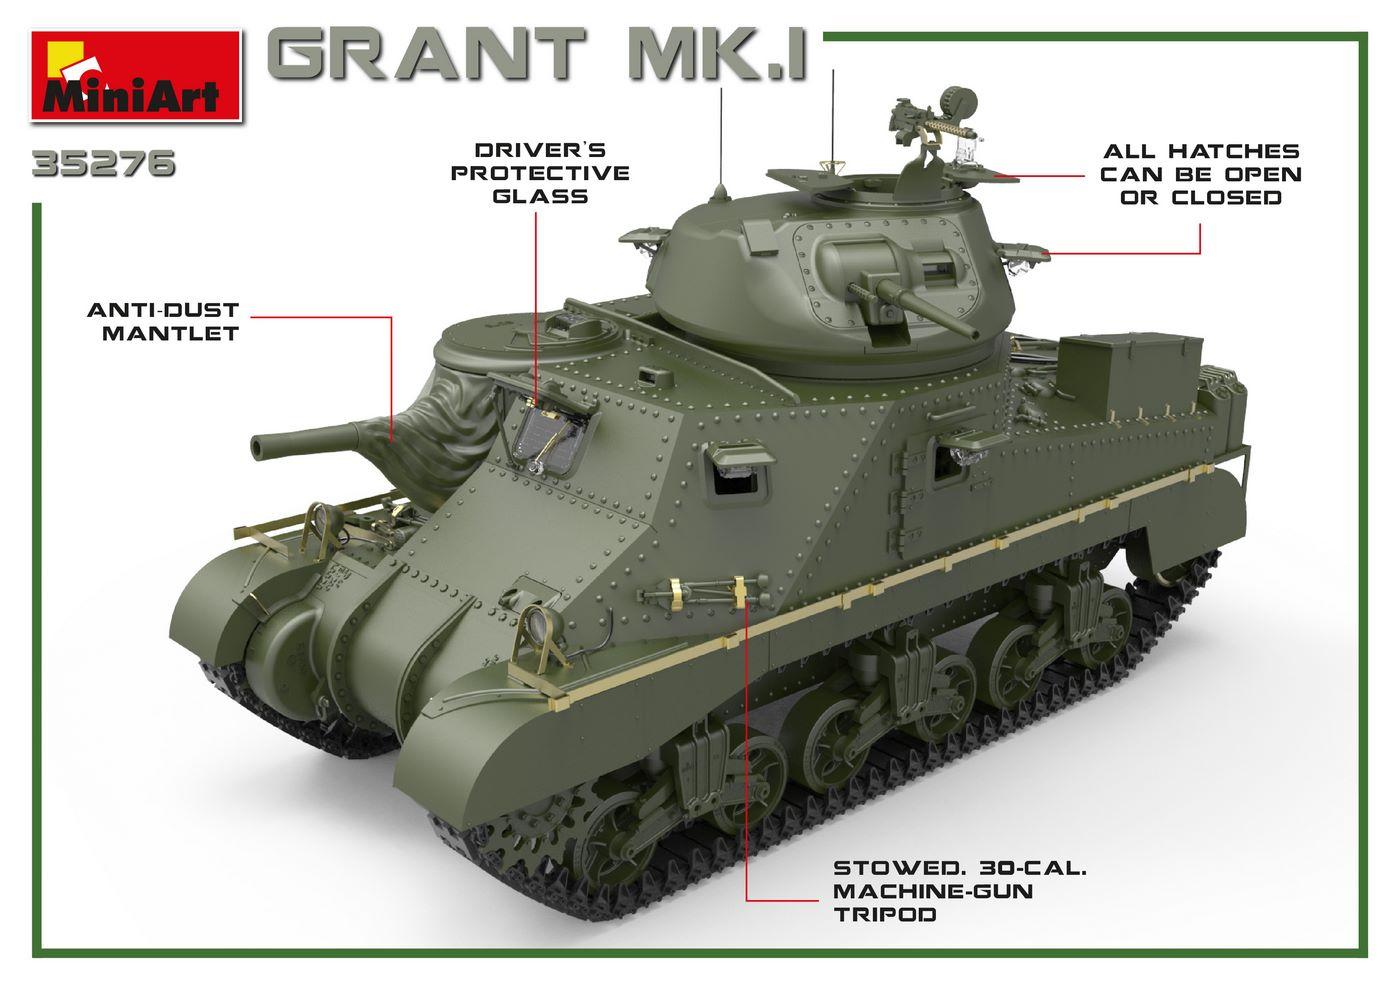 1/35 GRANT Mk.I 35276